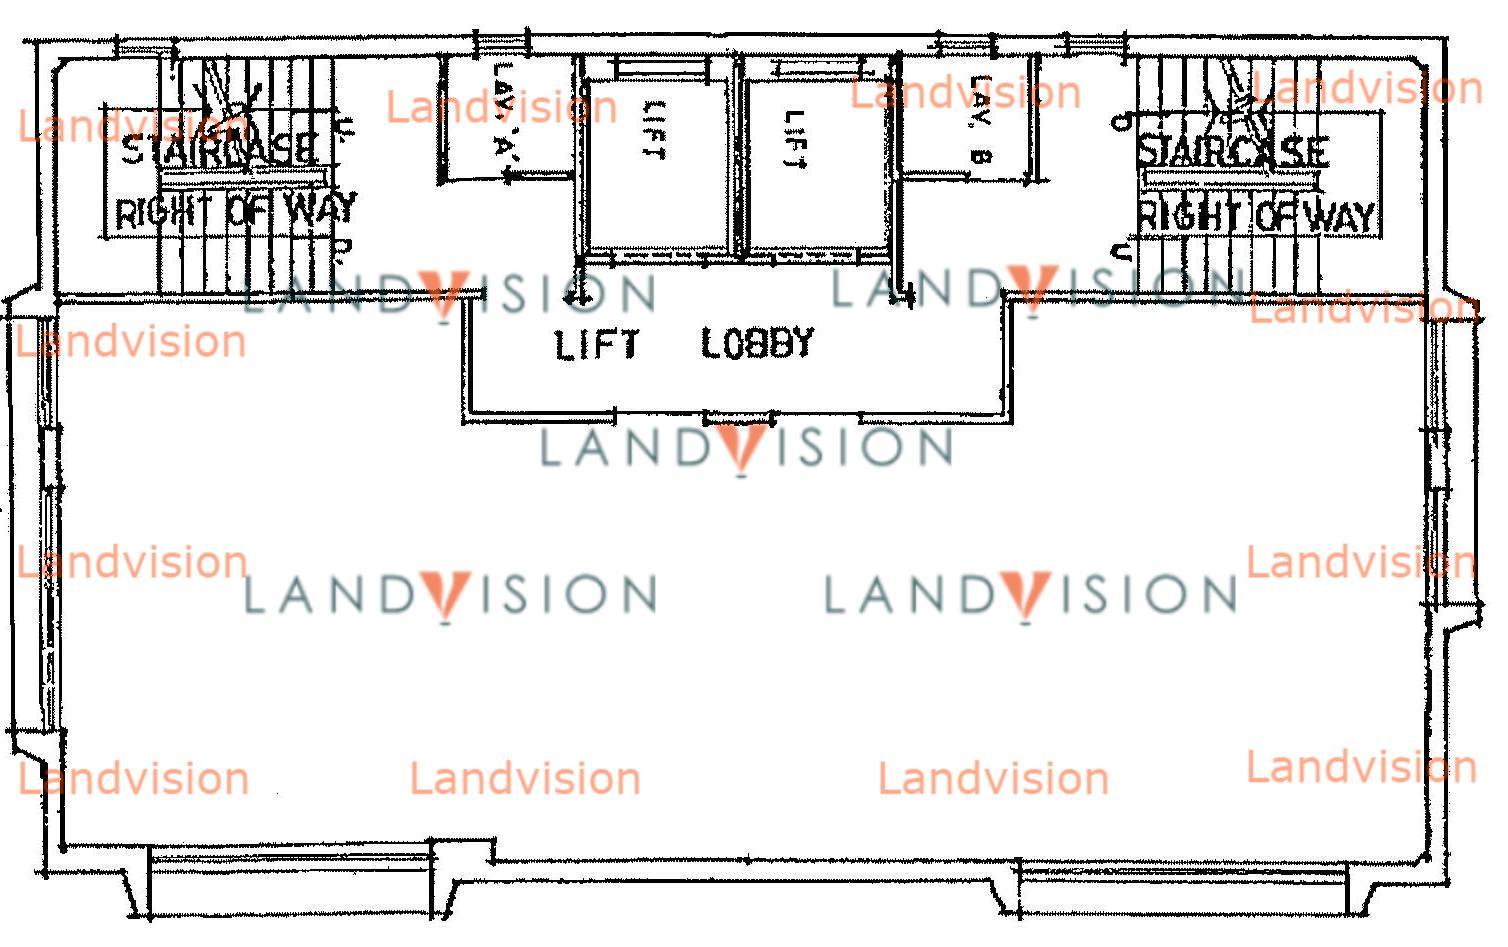 https://www.landvision.com.hk/wp-content/uploads/website/resize/floorplans/000845.JPG